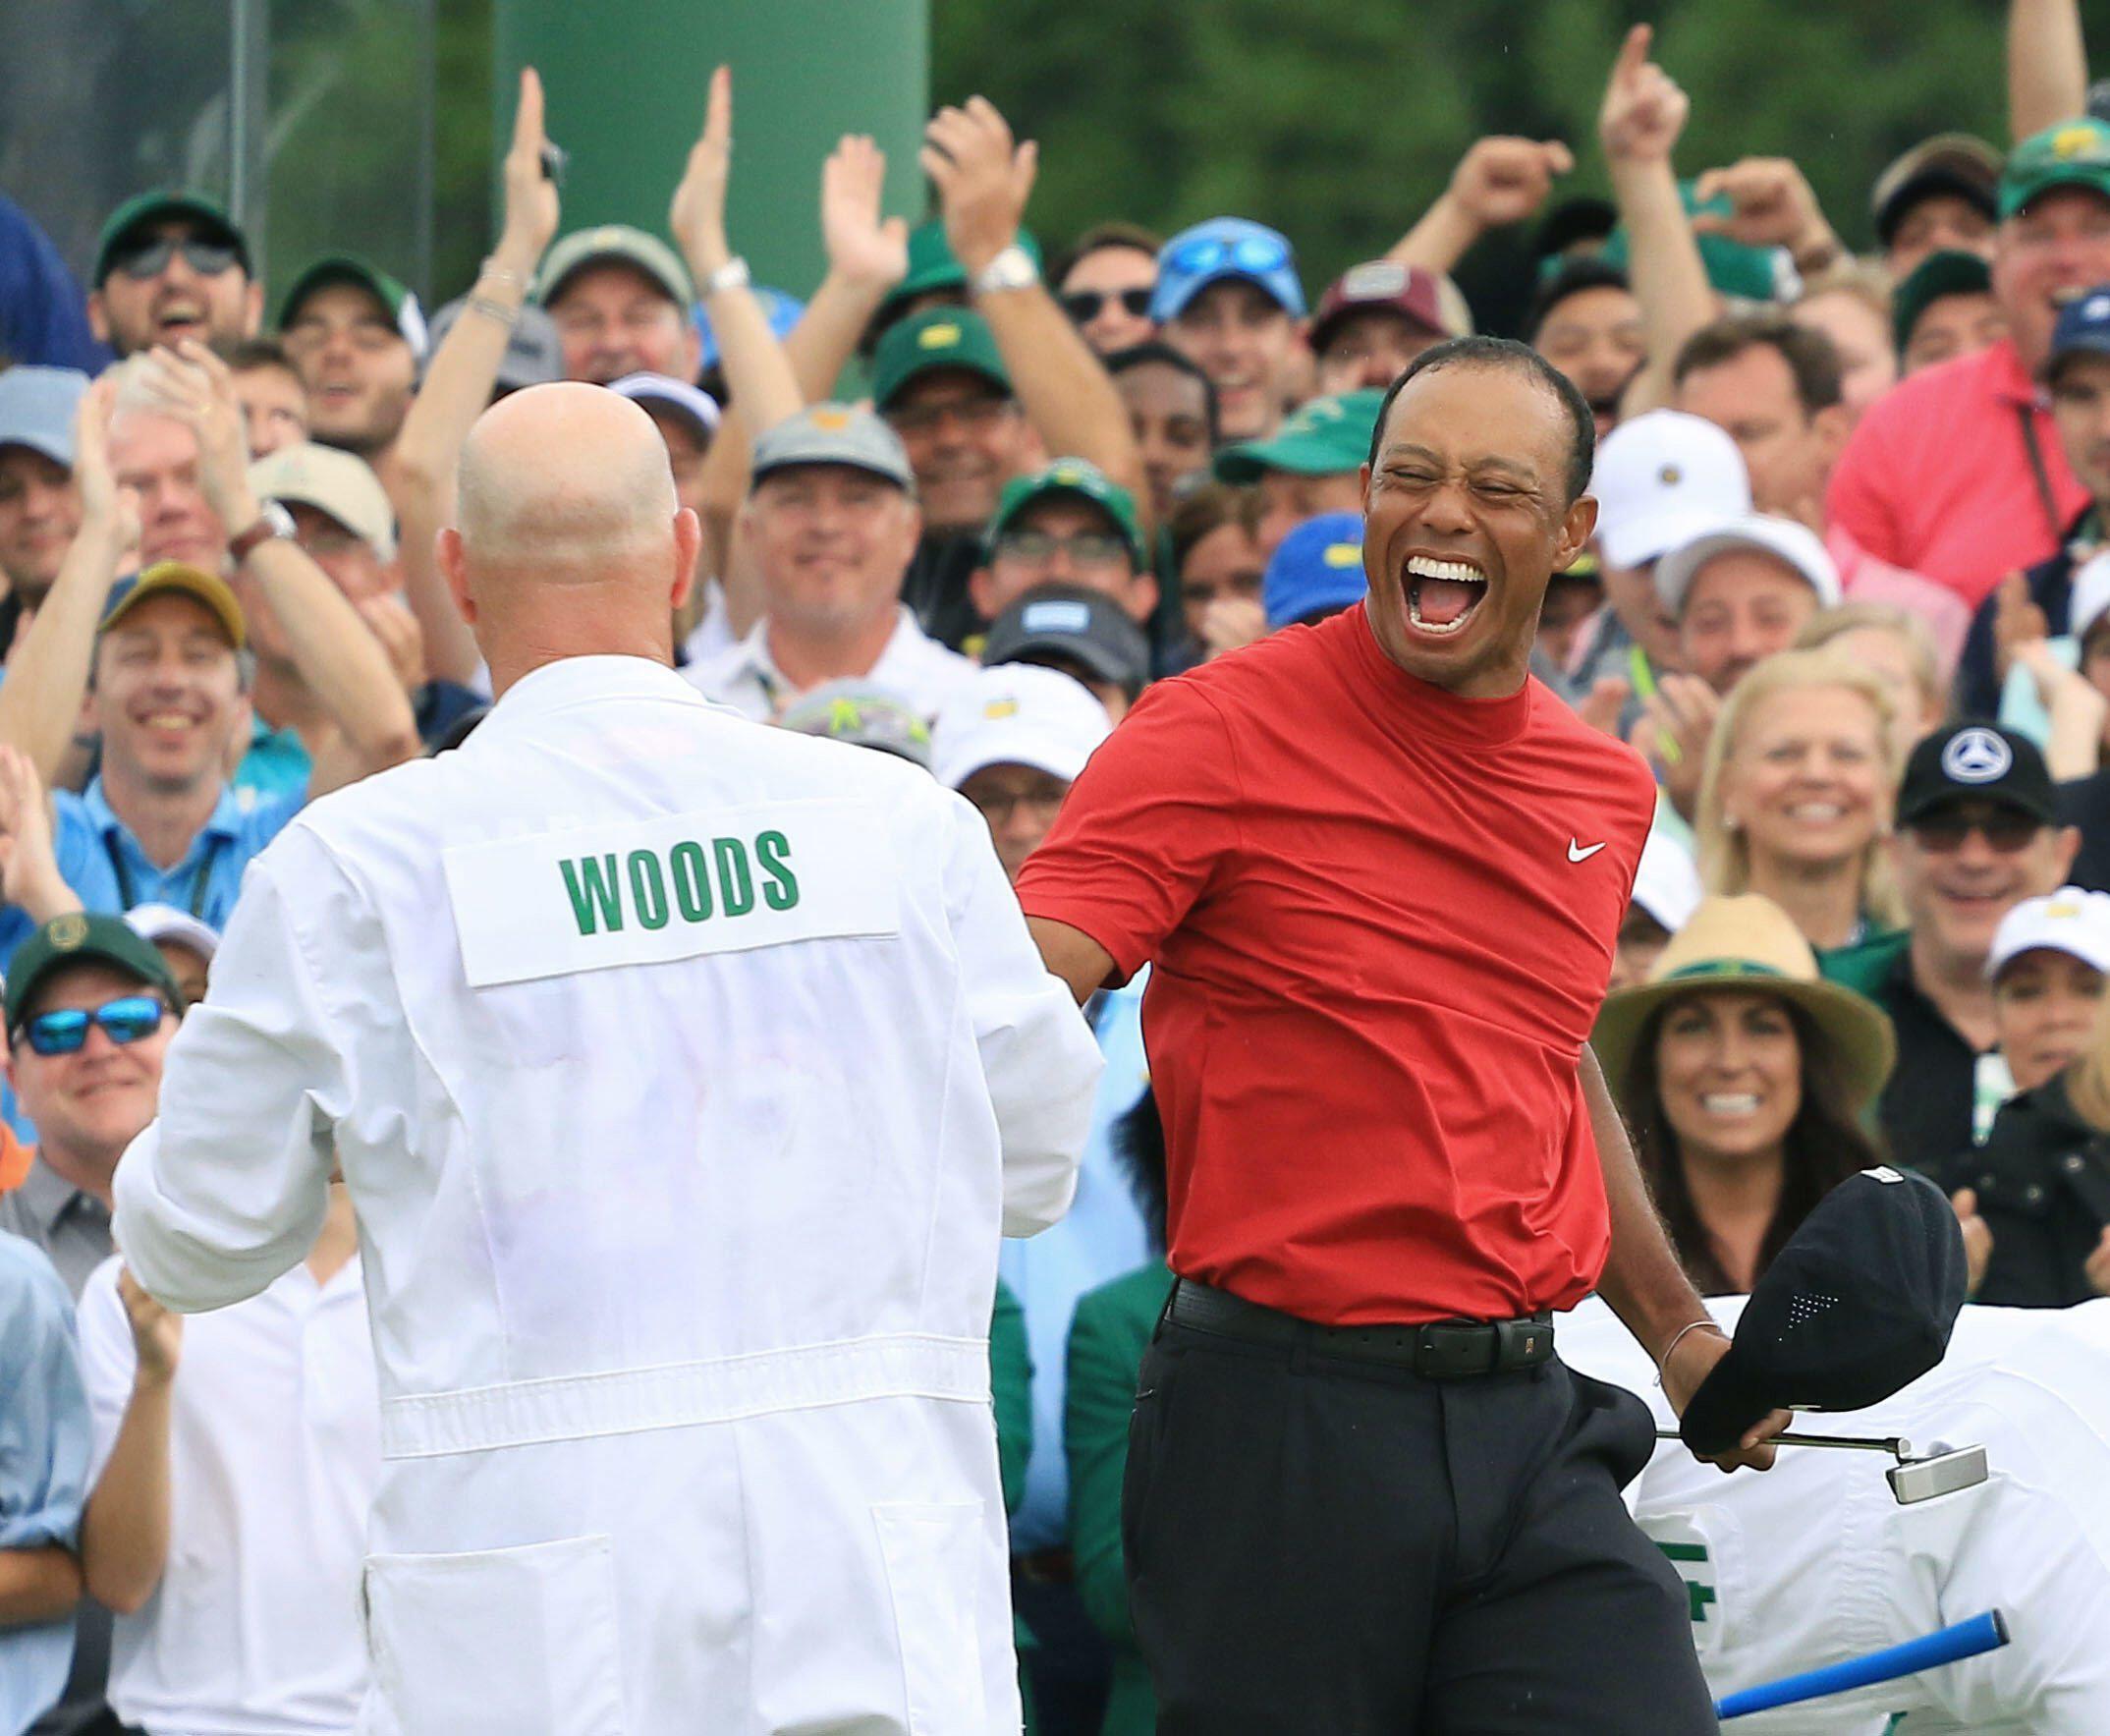 Bild zu Tiger Woods, Caddie, Masters, US Masters, Augusta, Sieg, Jubel, Georgia, 2019, National Golf Club